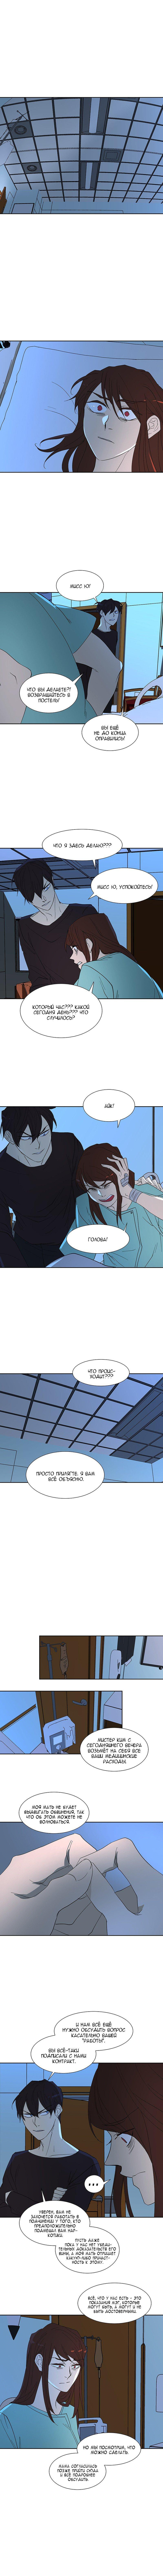 Манга Я люблю Ю / I love Yoo  - Том 1 Глава 63 Страница 13